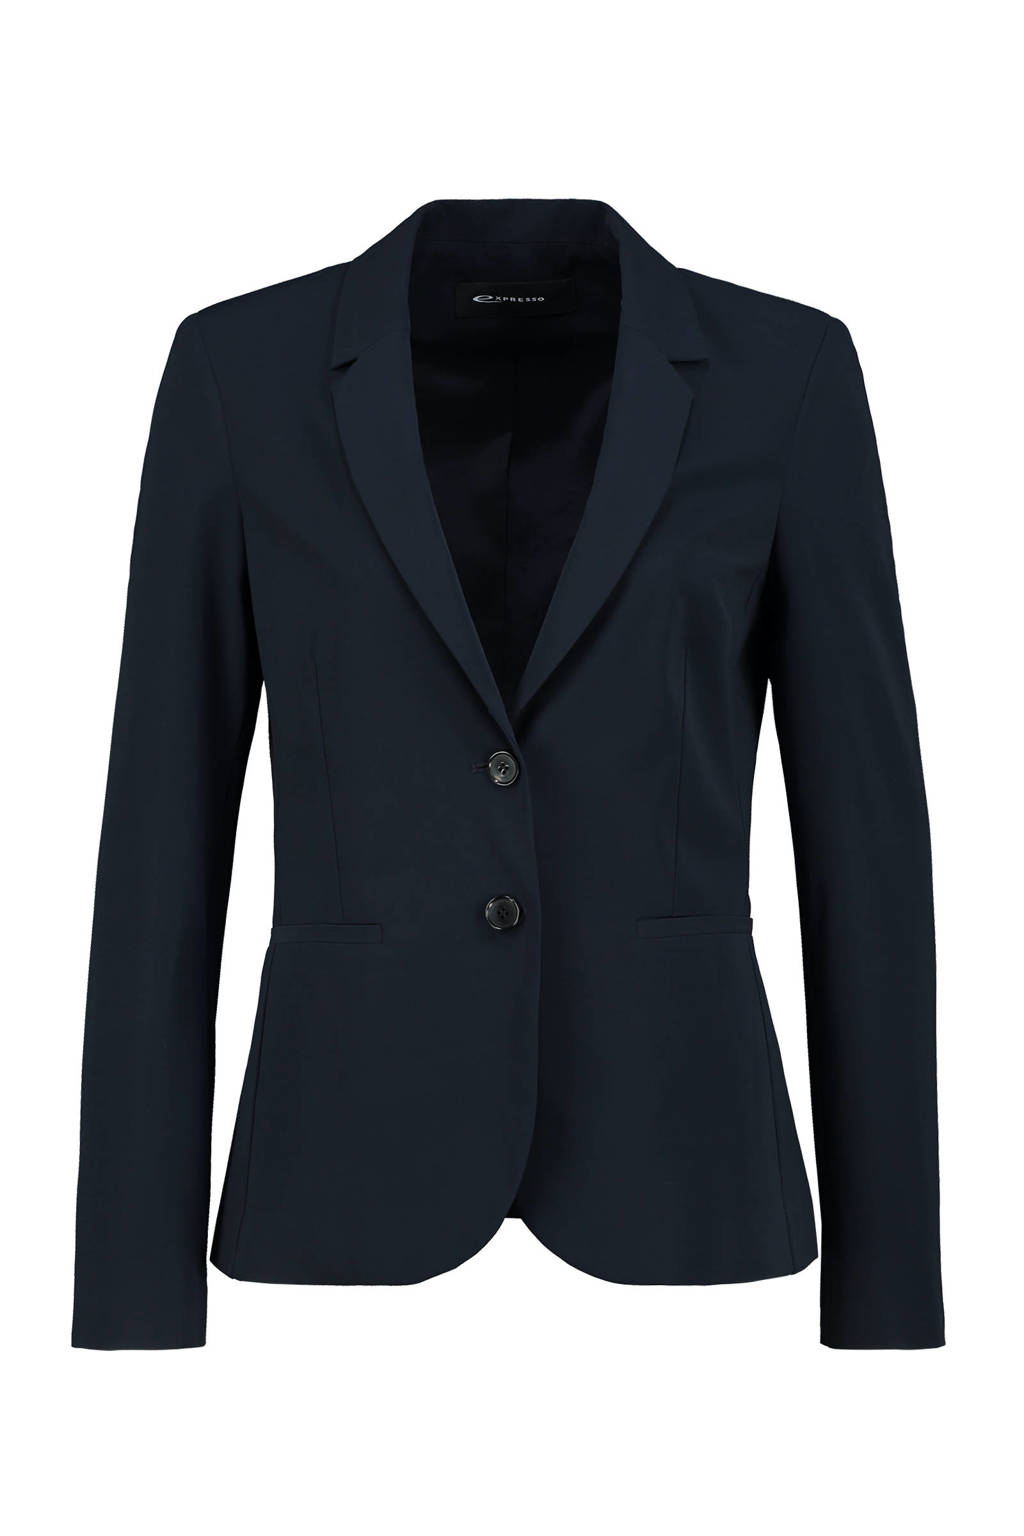 Expresso blazer Xowly 345 d. blue